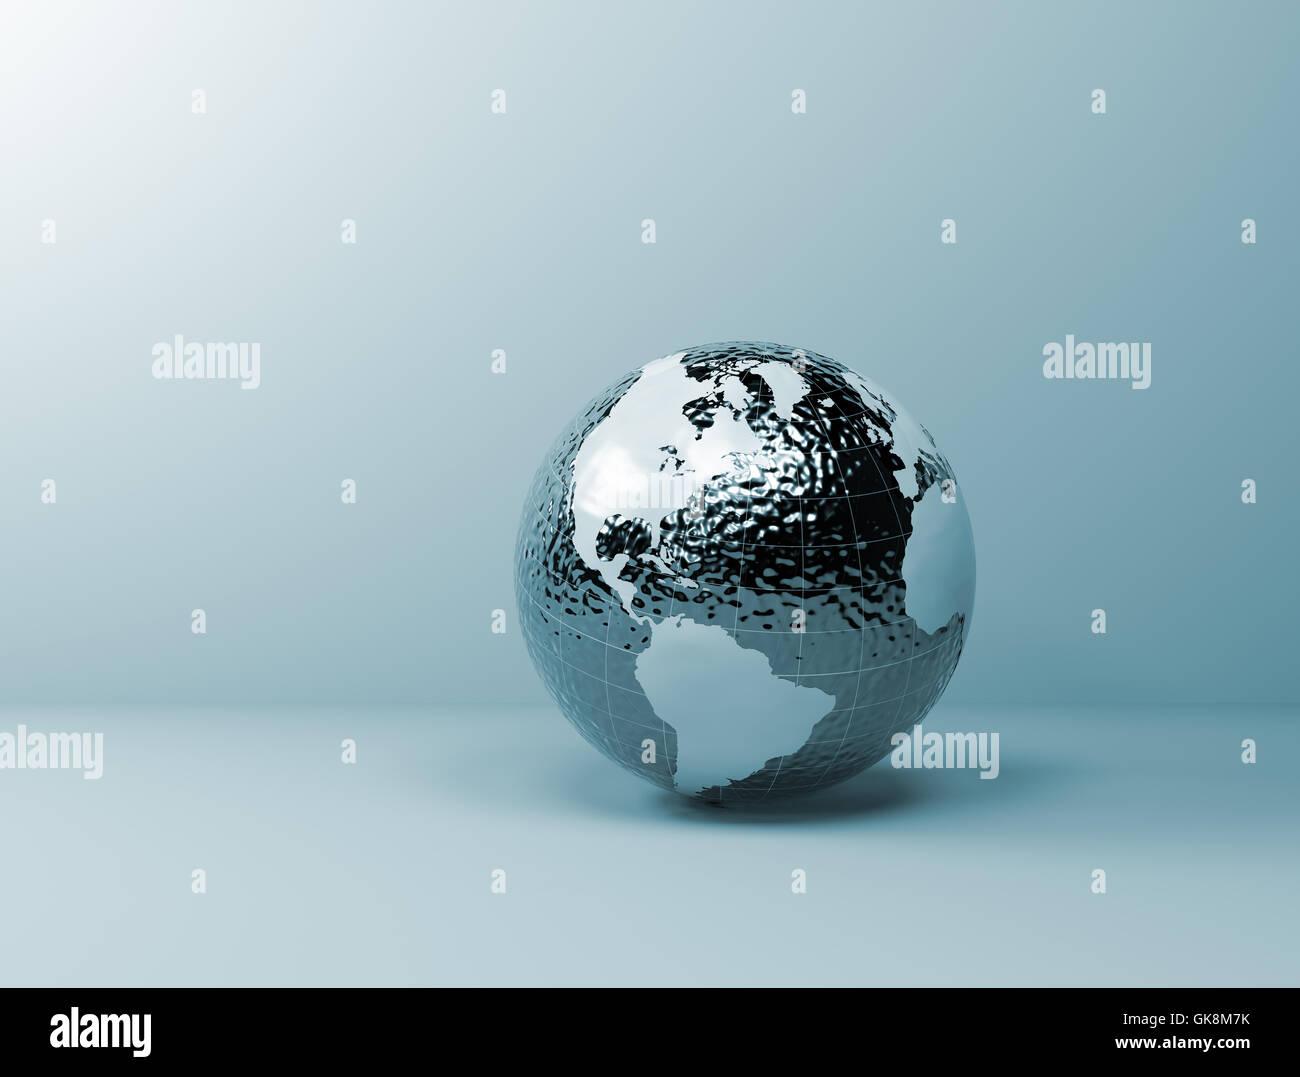 Background Image Futuristic Concept Silver Stockfotos & Background ...